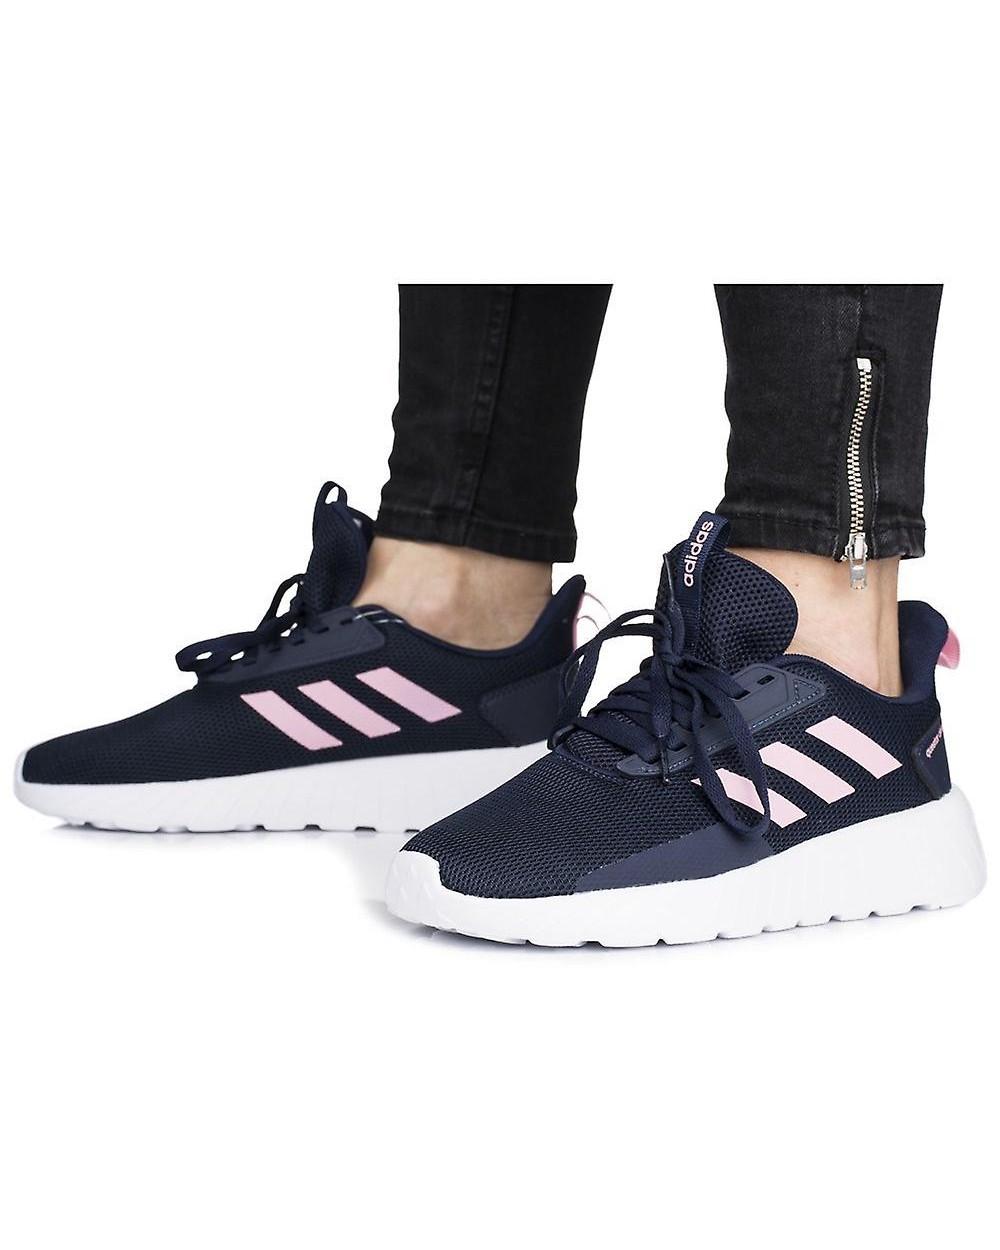 huge selection of f8de7 2cf68 Adidas chaussures gymnastique sportif Sneakers Questar Drive Femme bleu 6 6  sur 9 ...